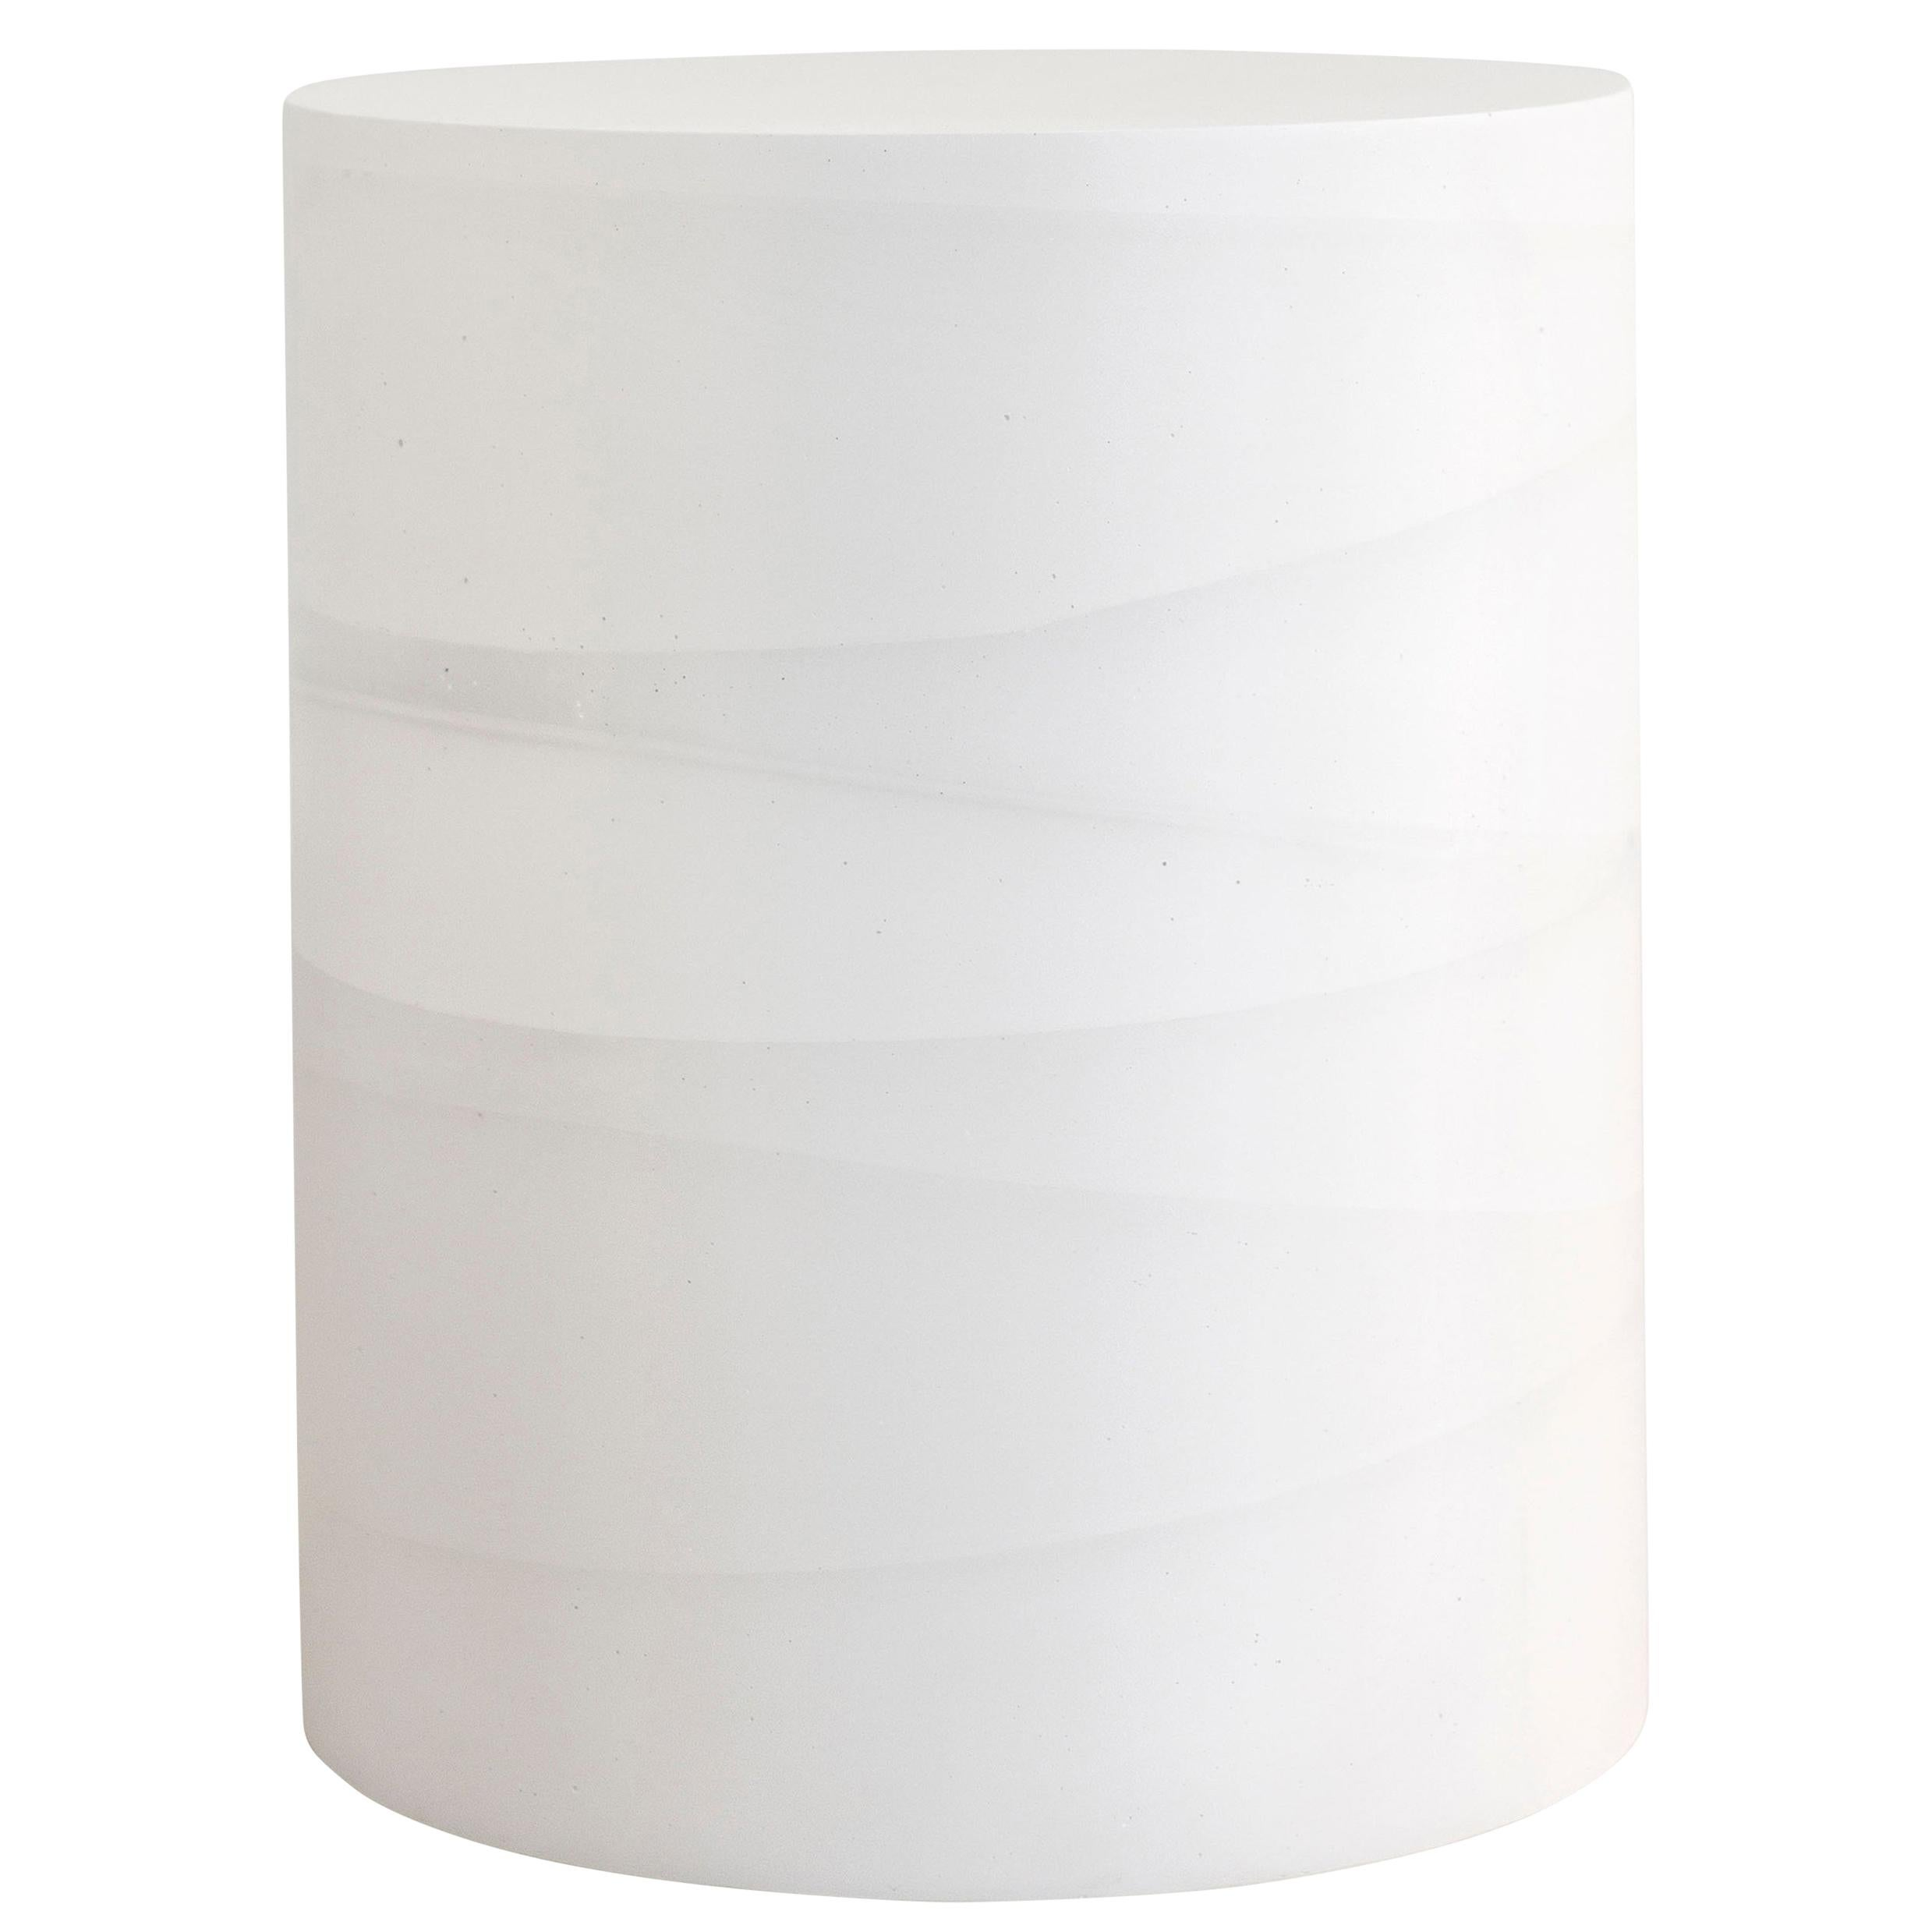 Fade Drum, White Cement by Fernando Mastrangelo, 1stDibs New York